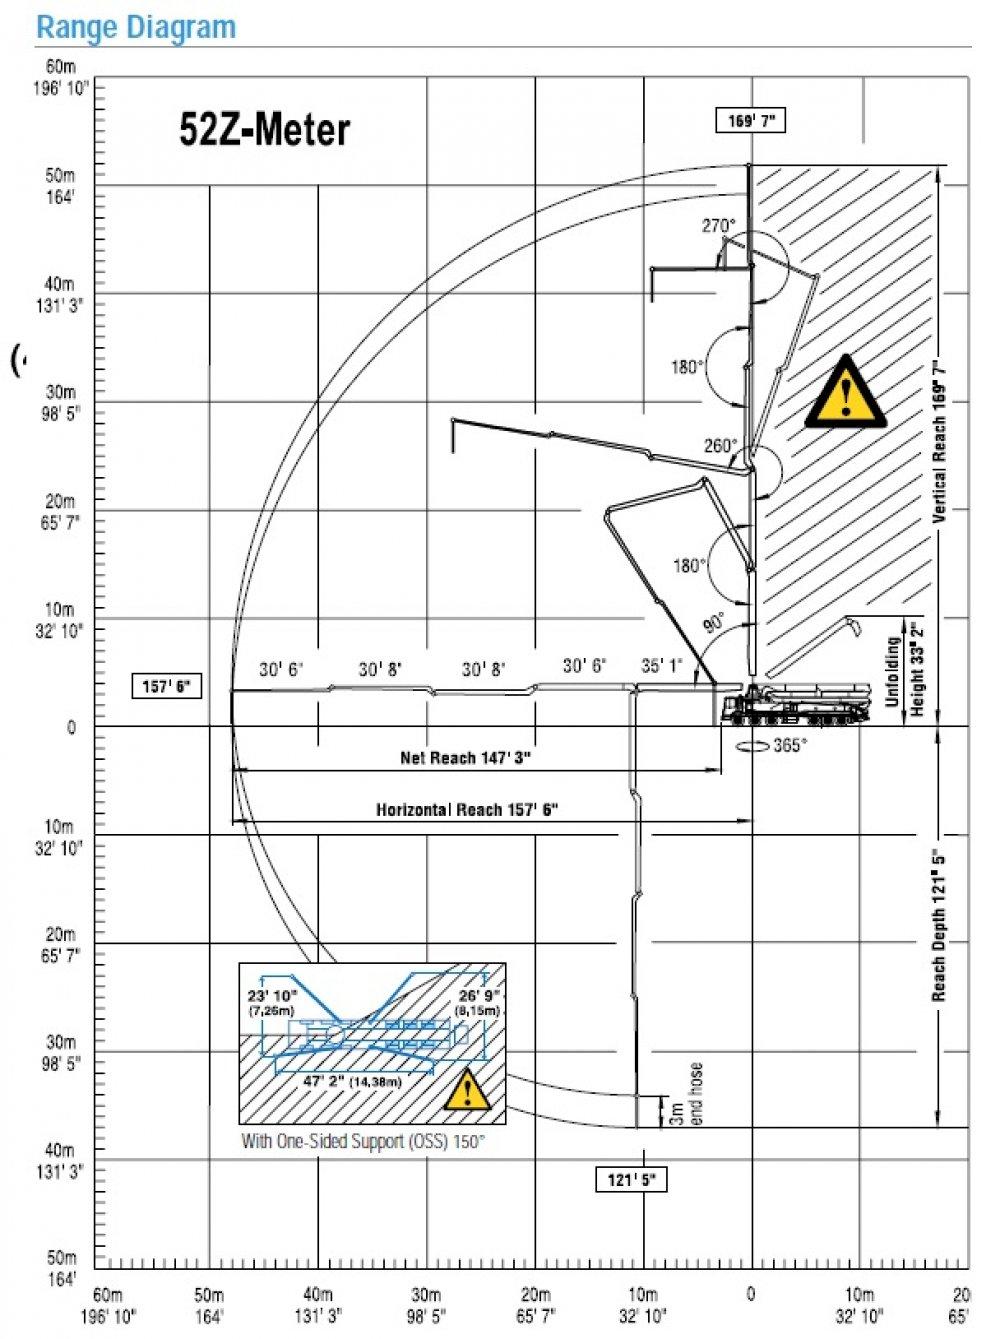 pompe boom putzmeister bsf52z 16h for rent tpg concrete pumping wiring color standards concrete pumps for rent 52z boom pump range diagram